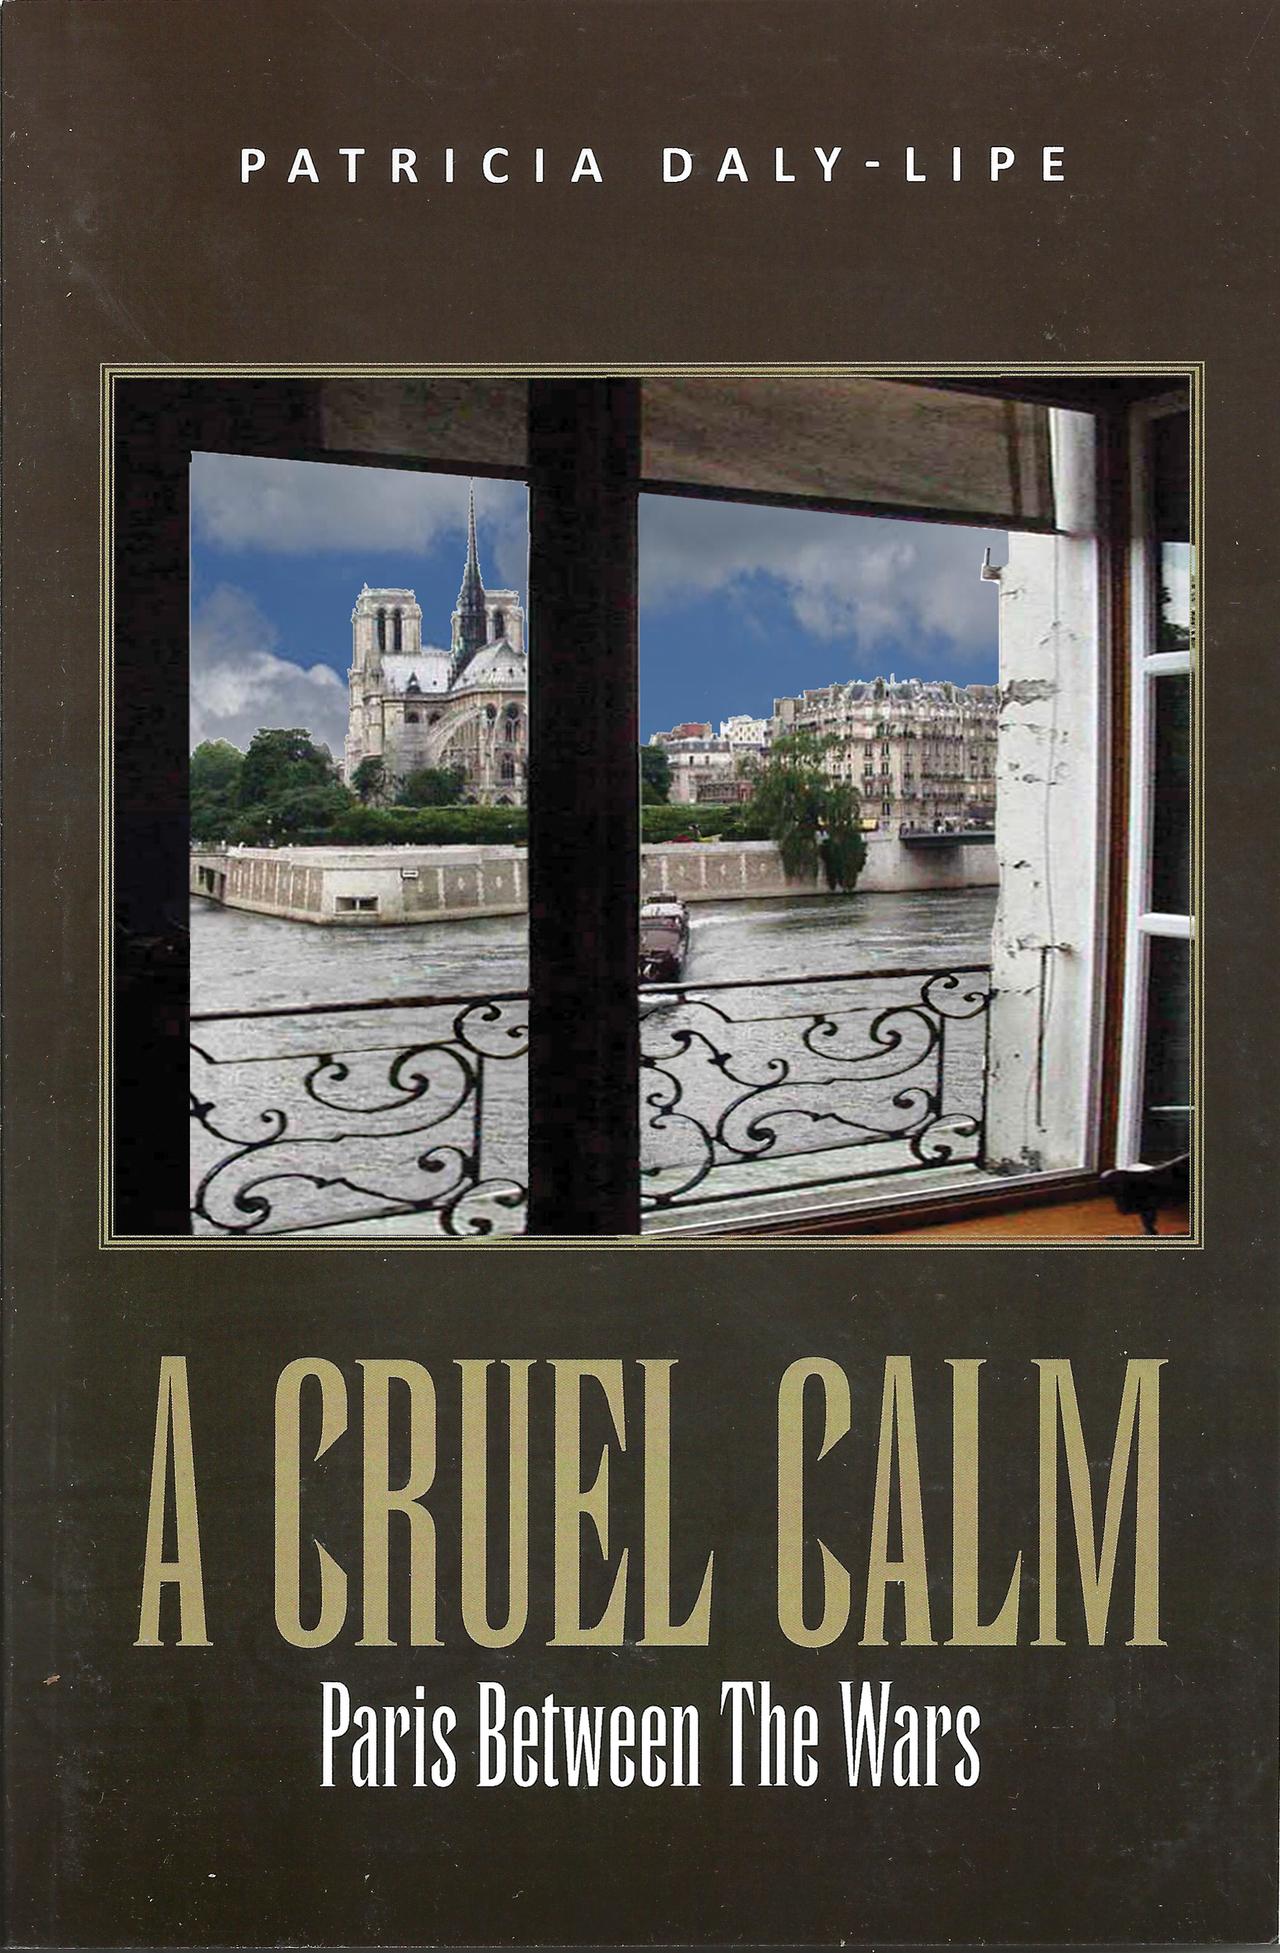 Cruel calm front